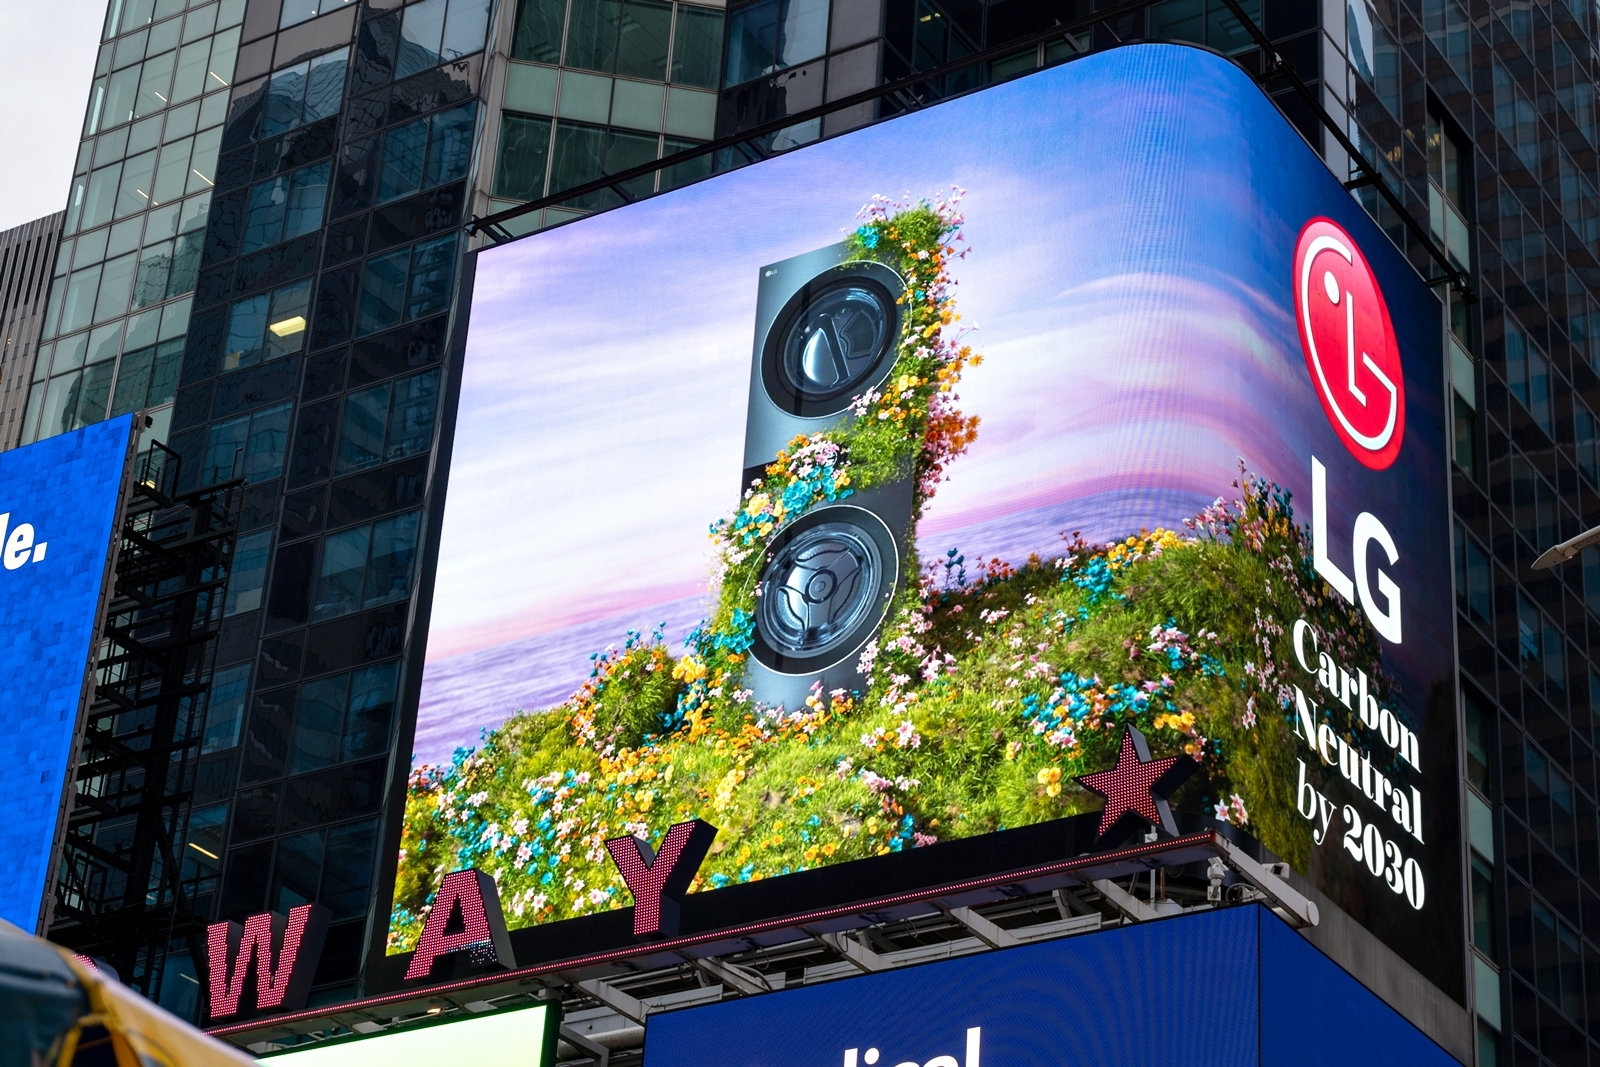 LG전자, '지구의 날' 맞아 환경보호 캠페인 펼쳐